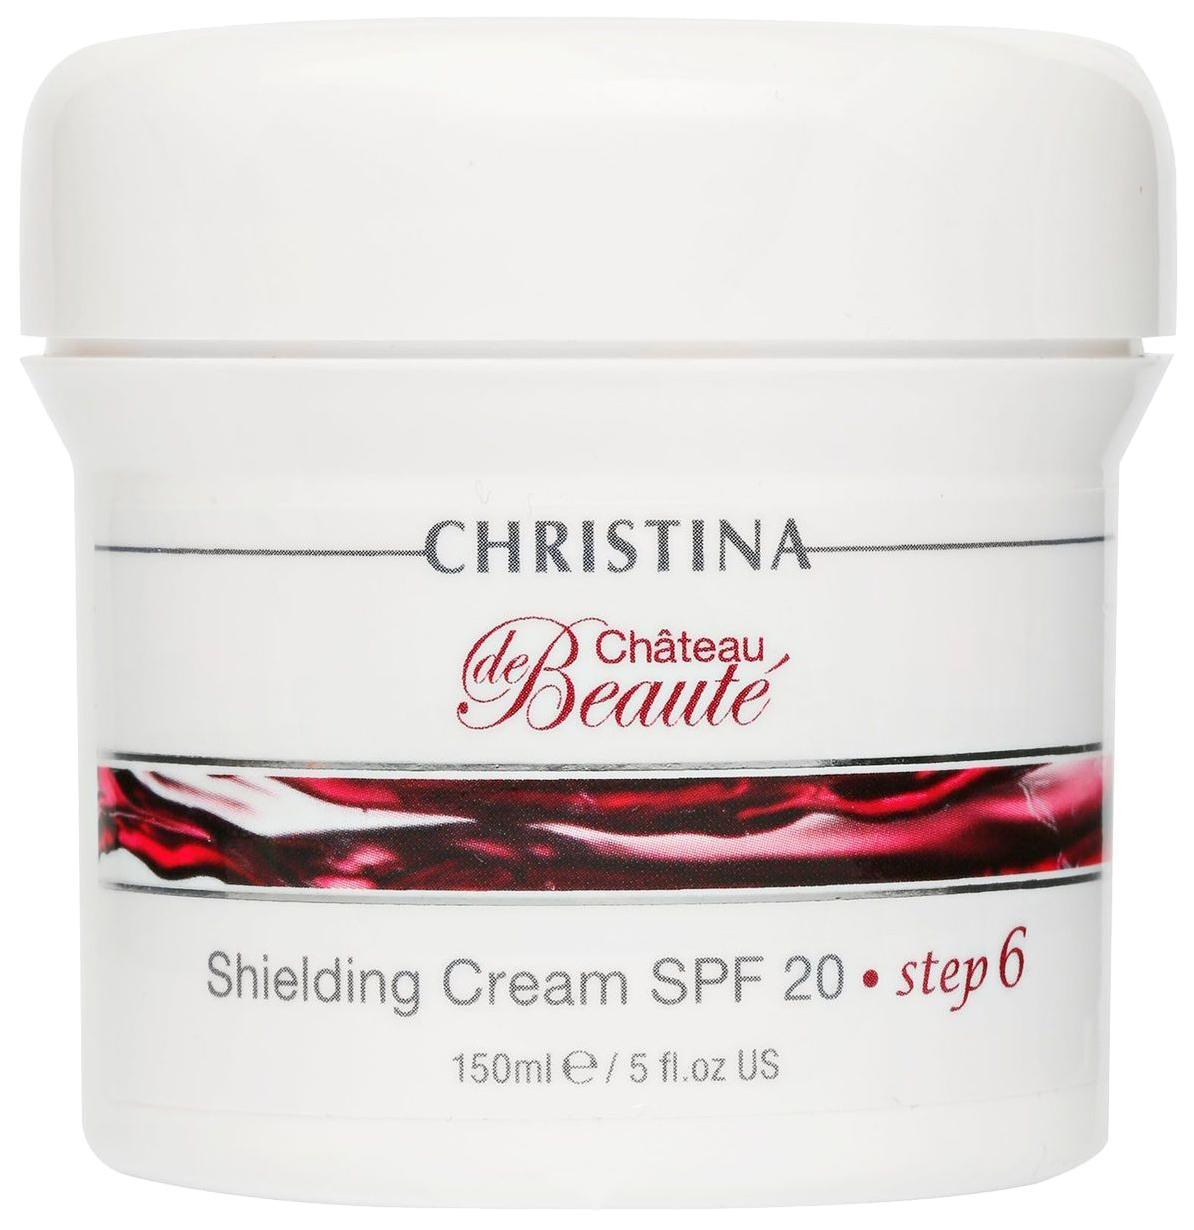 Крем для лица Christina Chateau de Beaute Шаг 6 Защитный крем SPF 20 150 мл